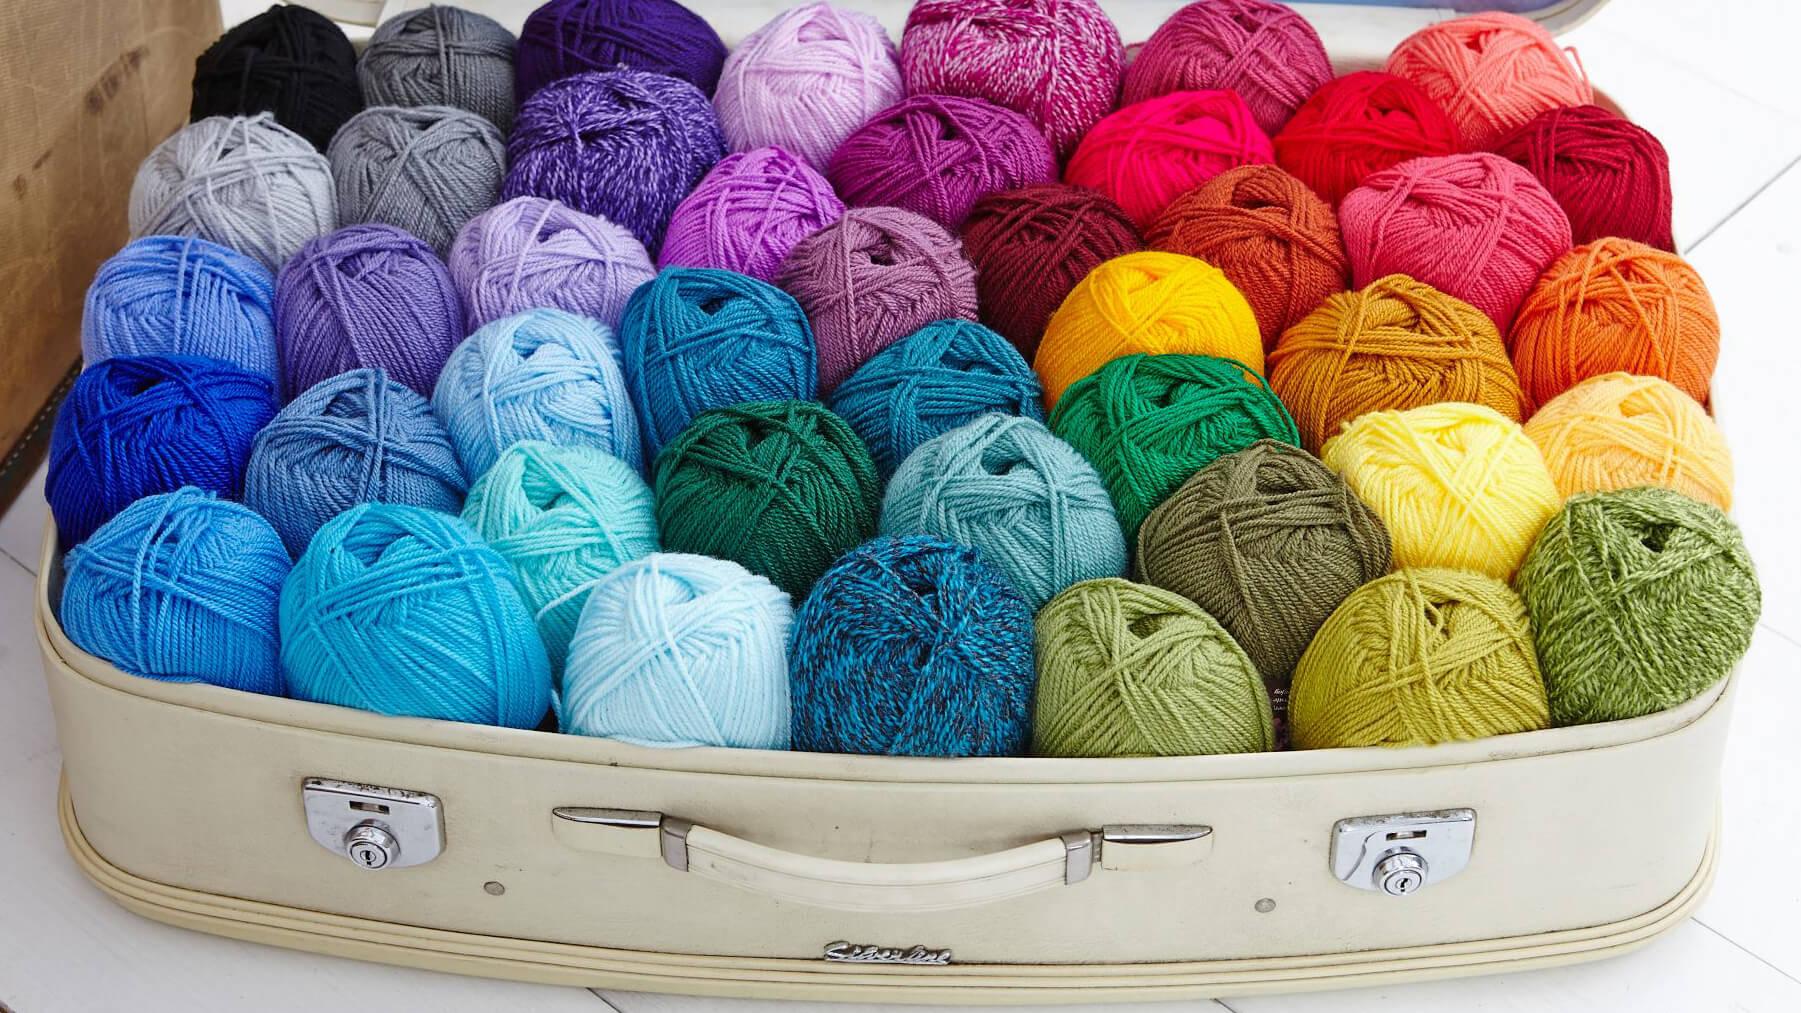 wool-and-tools Bibelot Leek